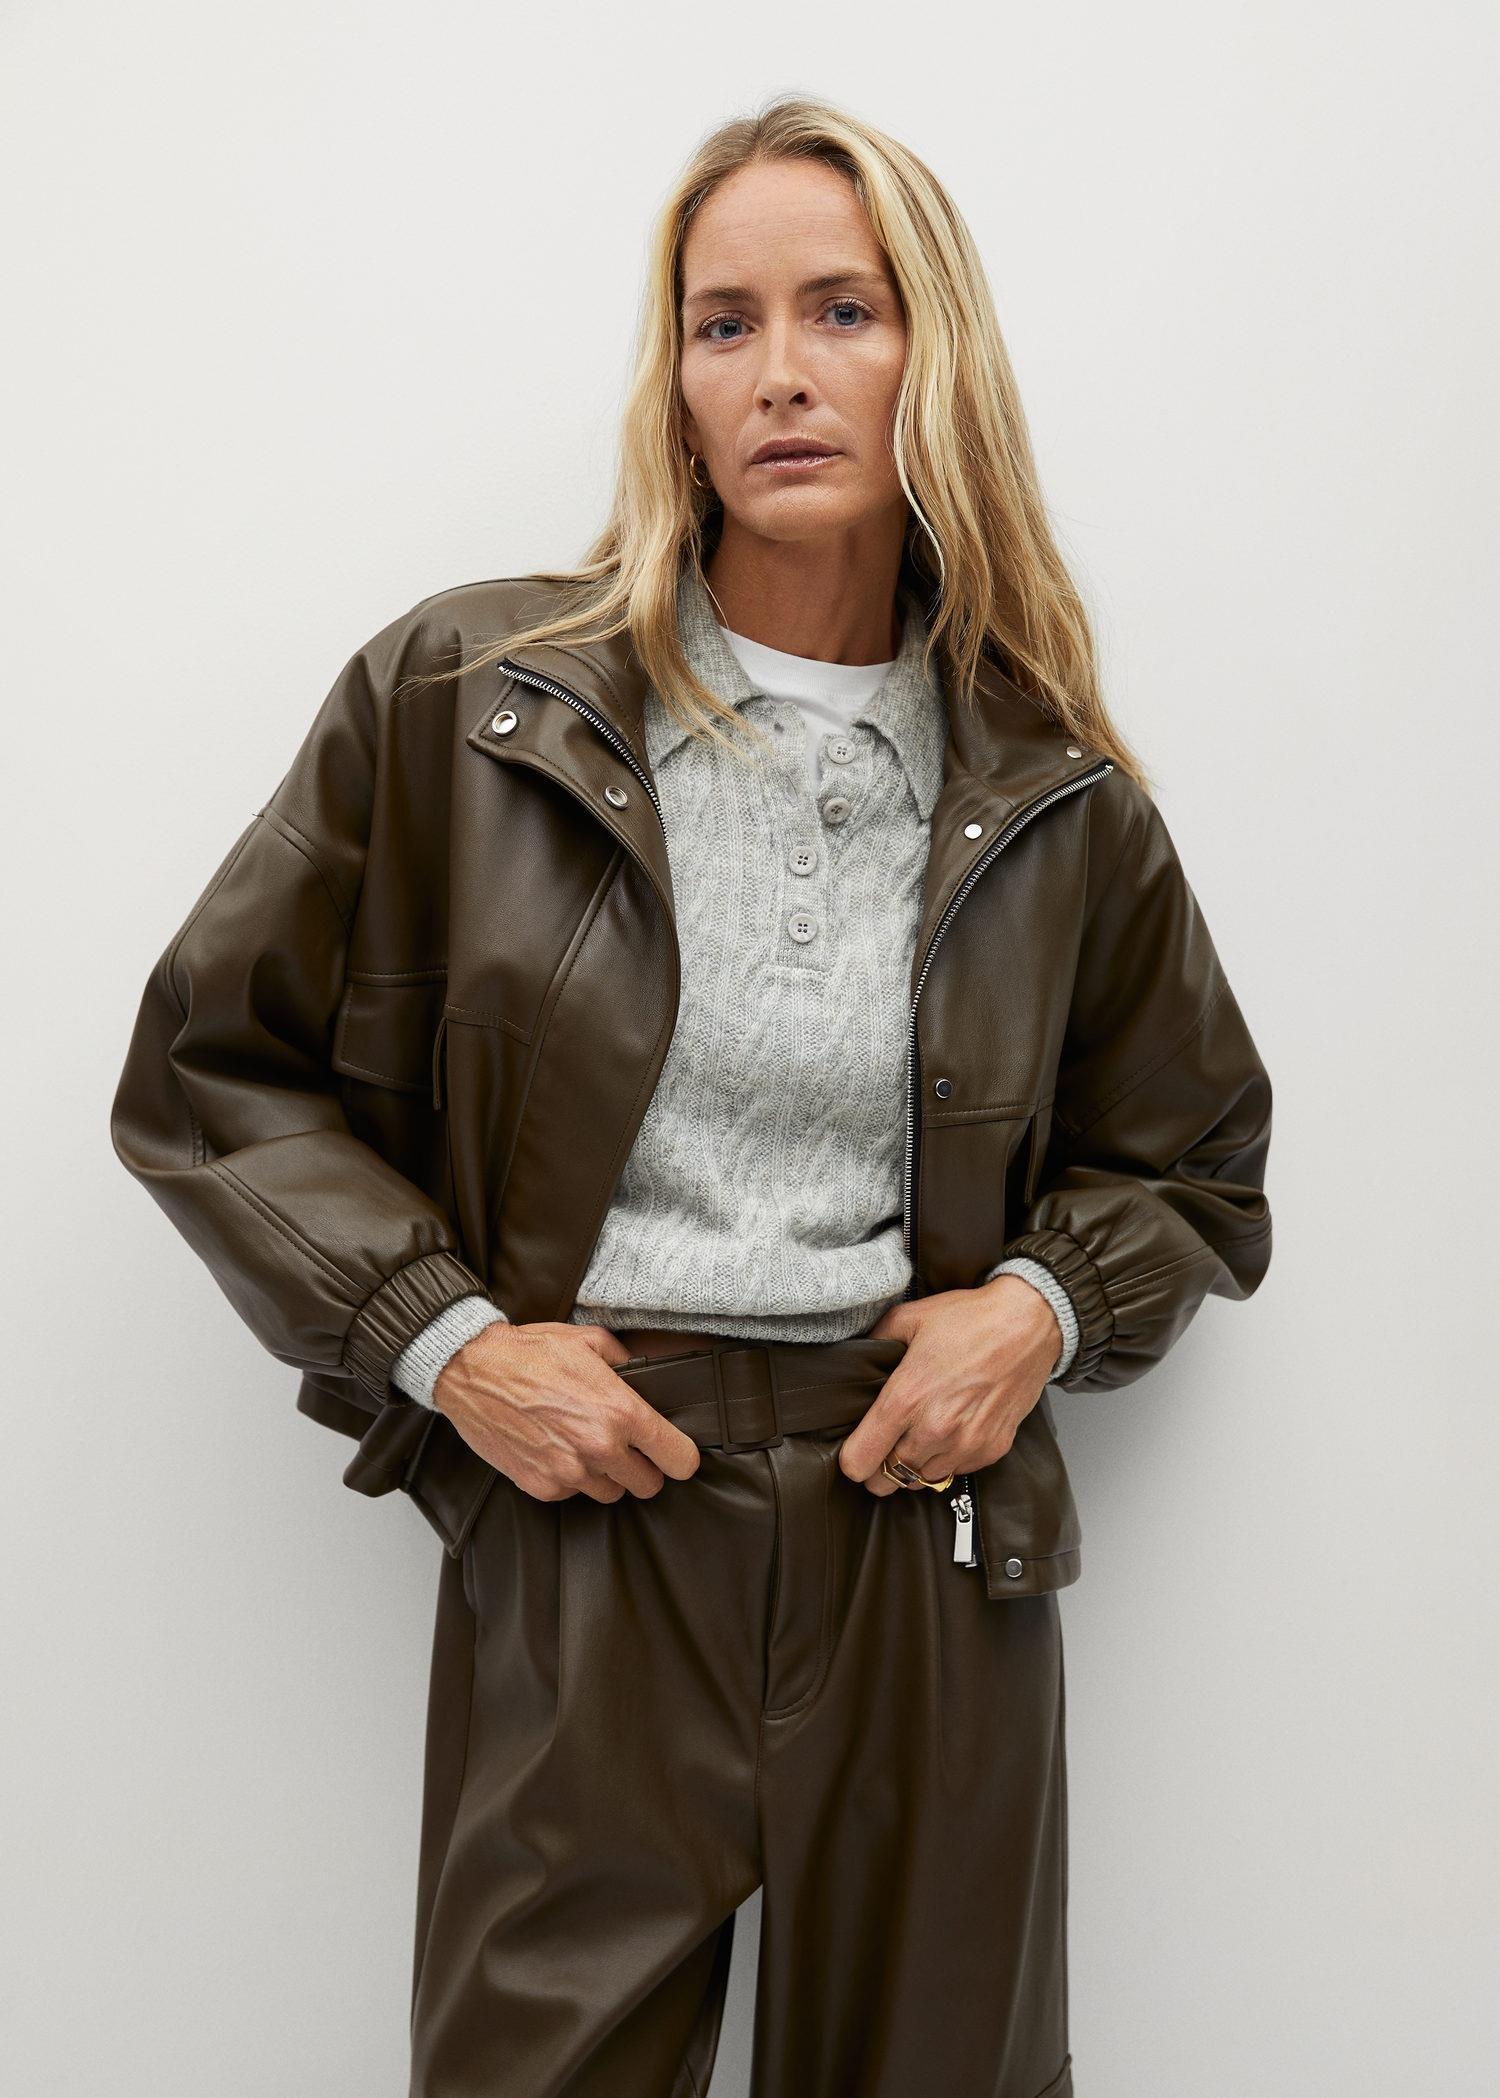 Jacket Wild Medium Beige Gibbons